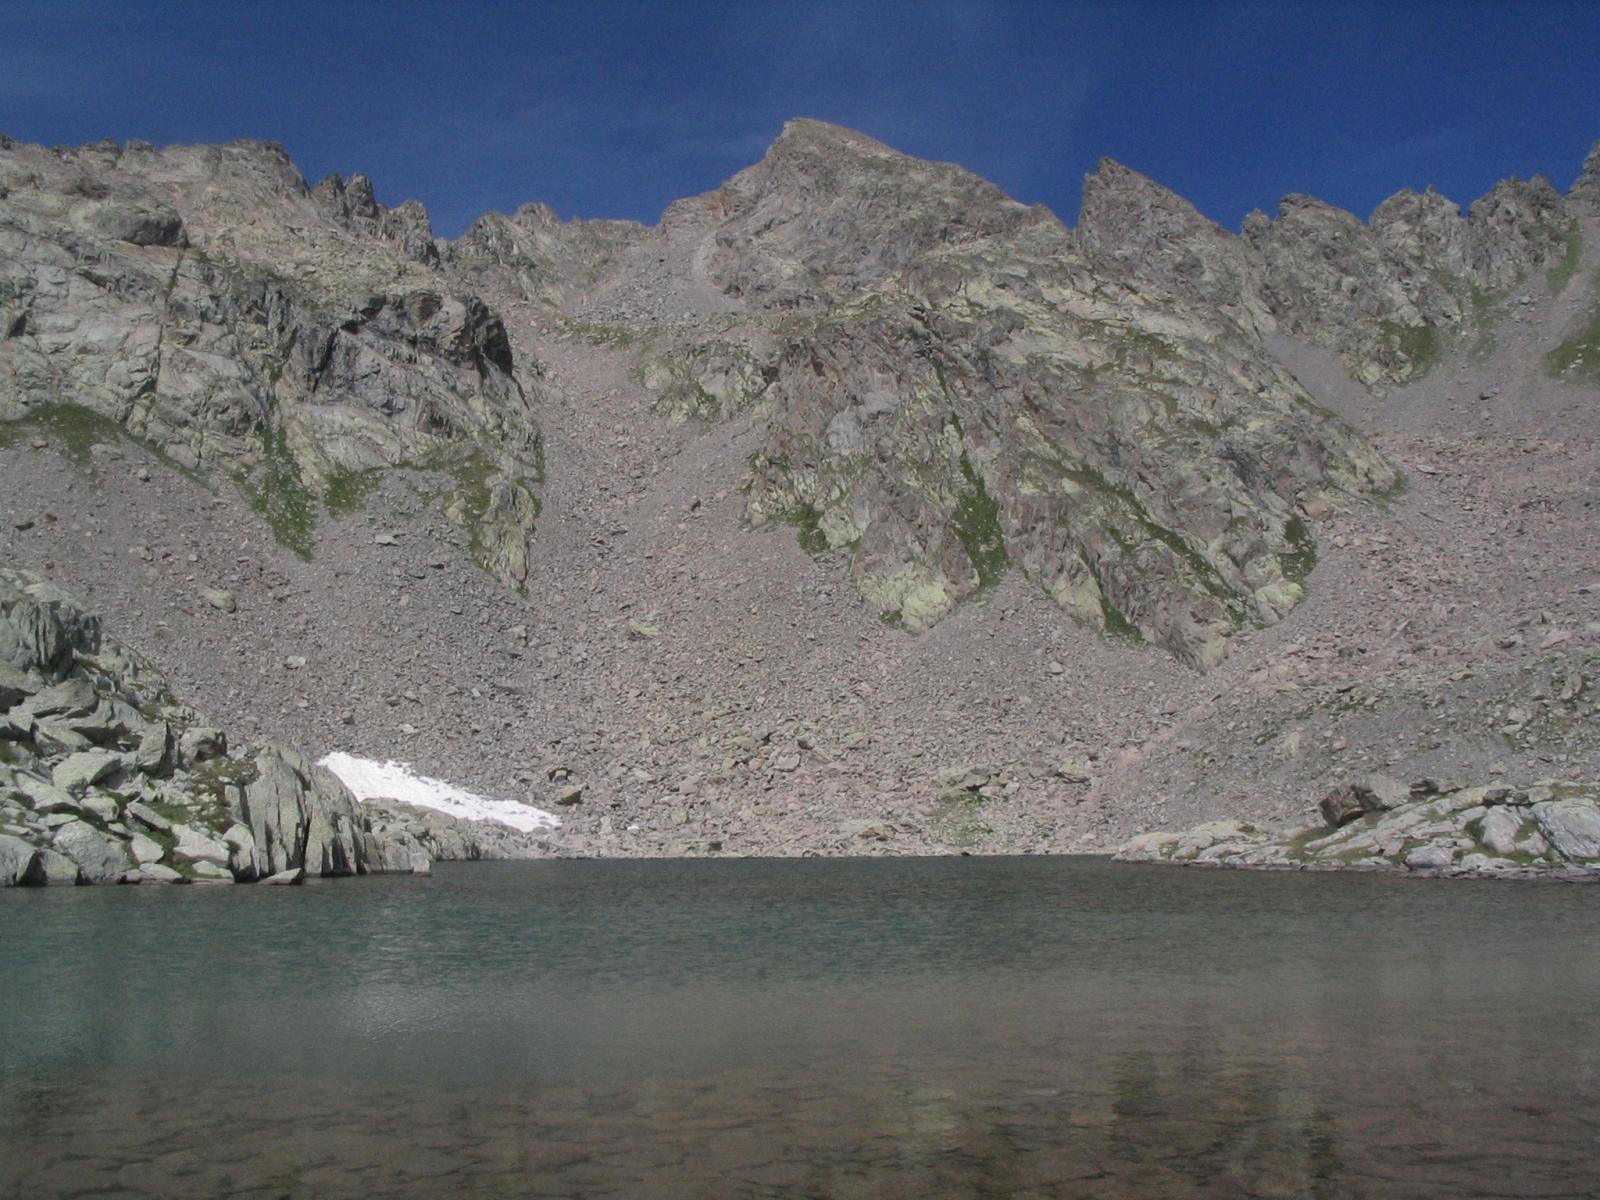 Acqua limpidissima del laghetto